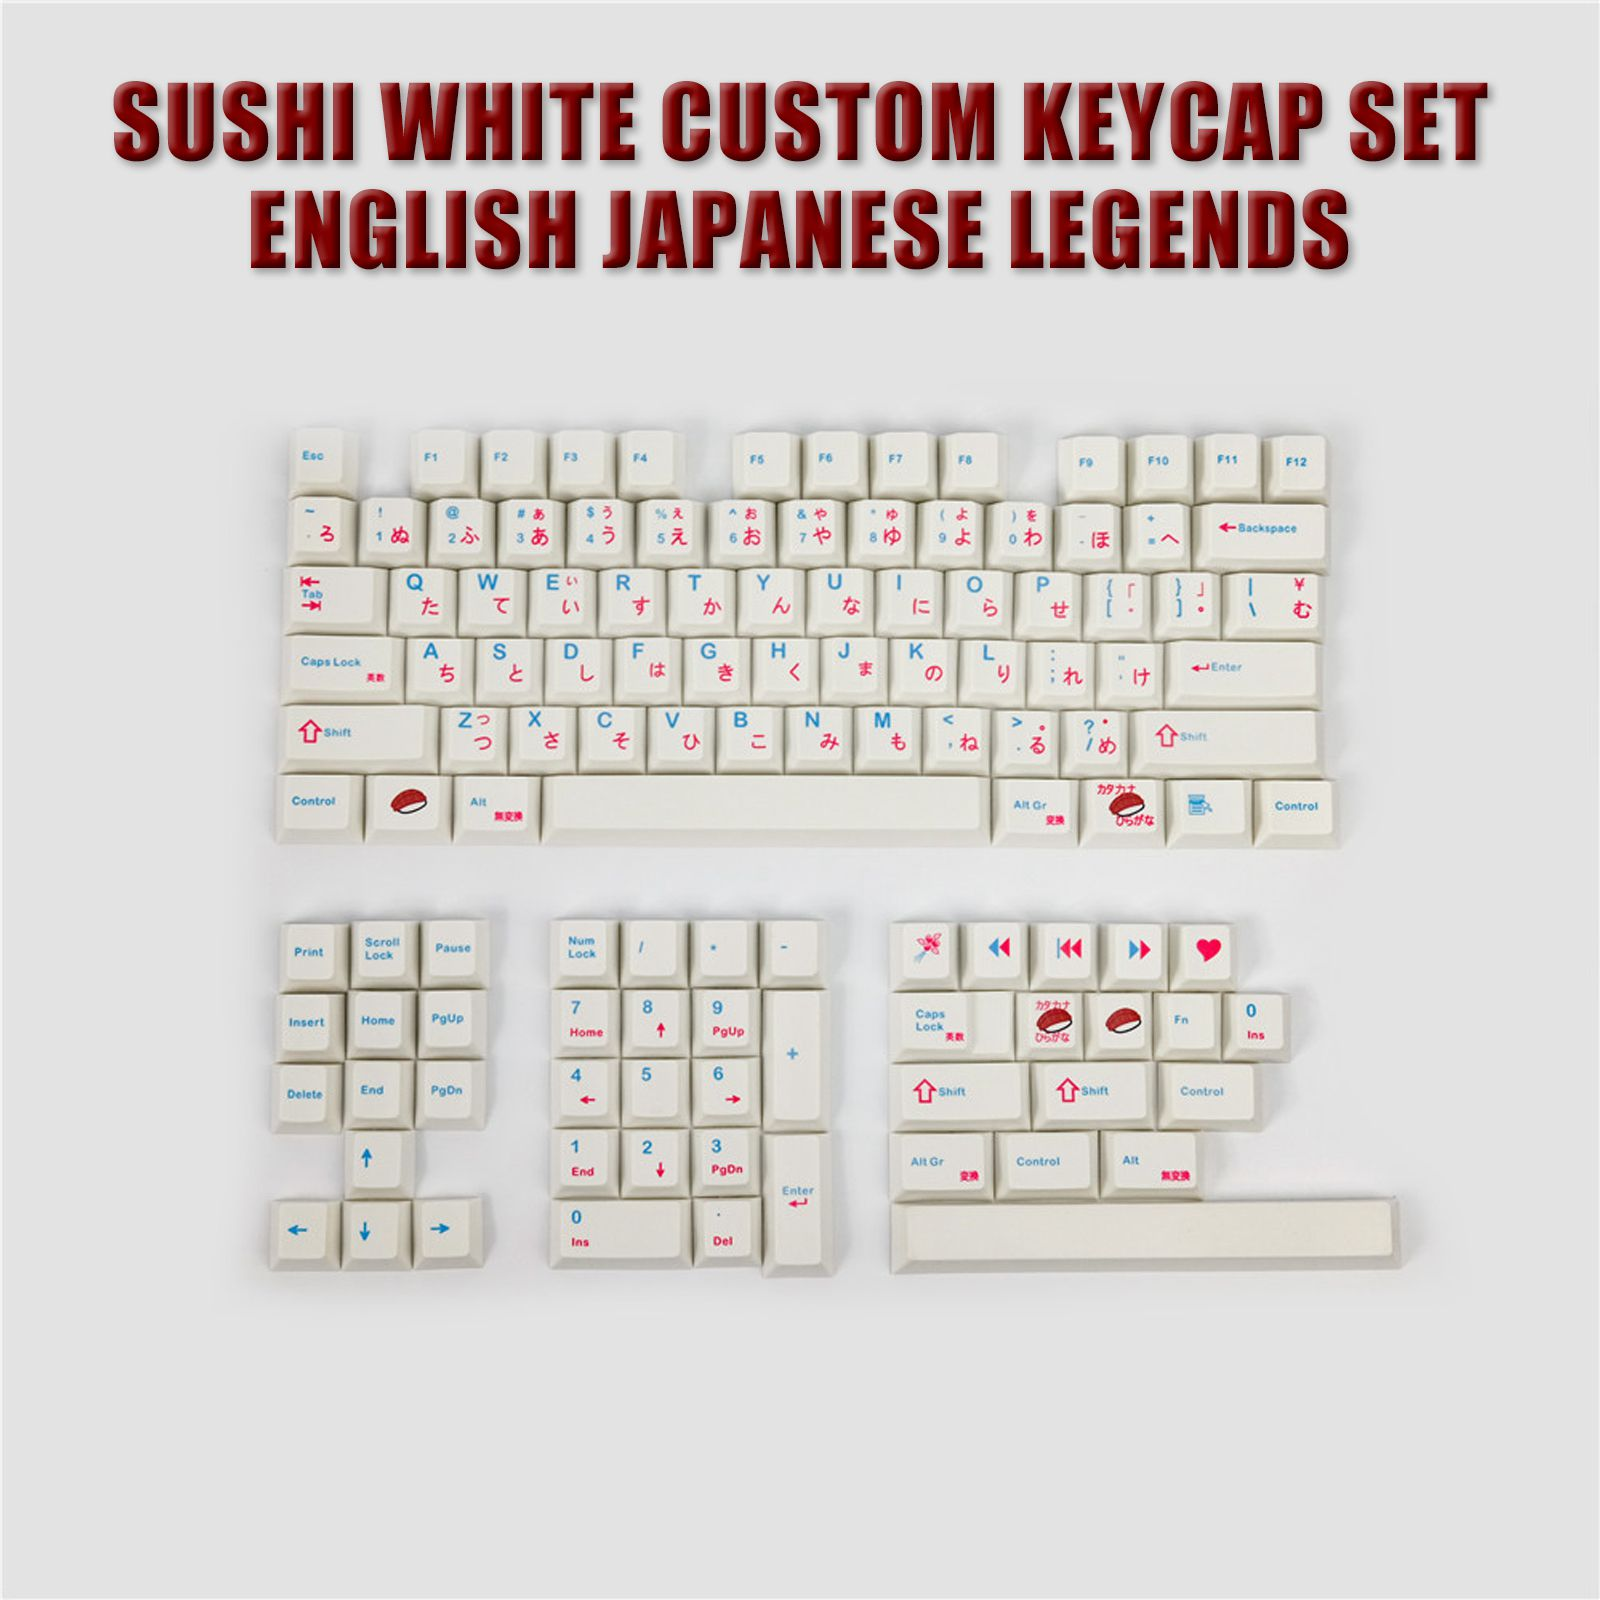 2021 New Japanese Sushi White Custom Keycap Set English Japanese Legends For MX Switches Mice & Keyboards Accessories